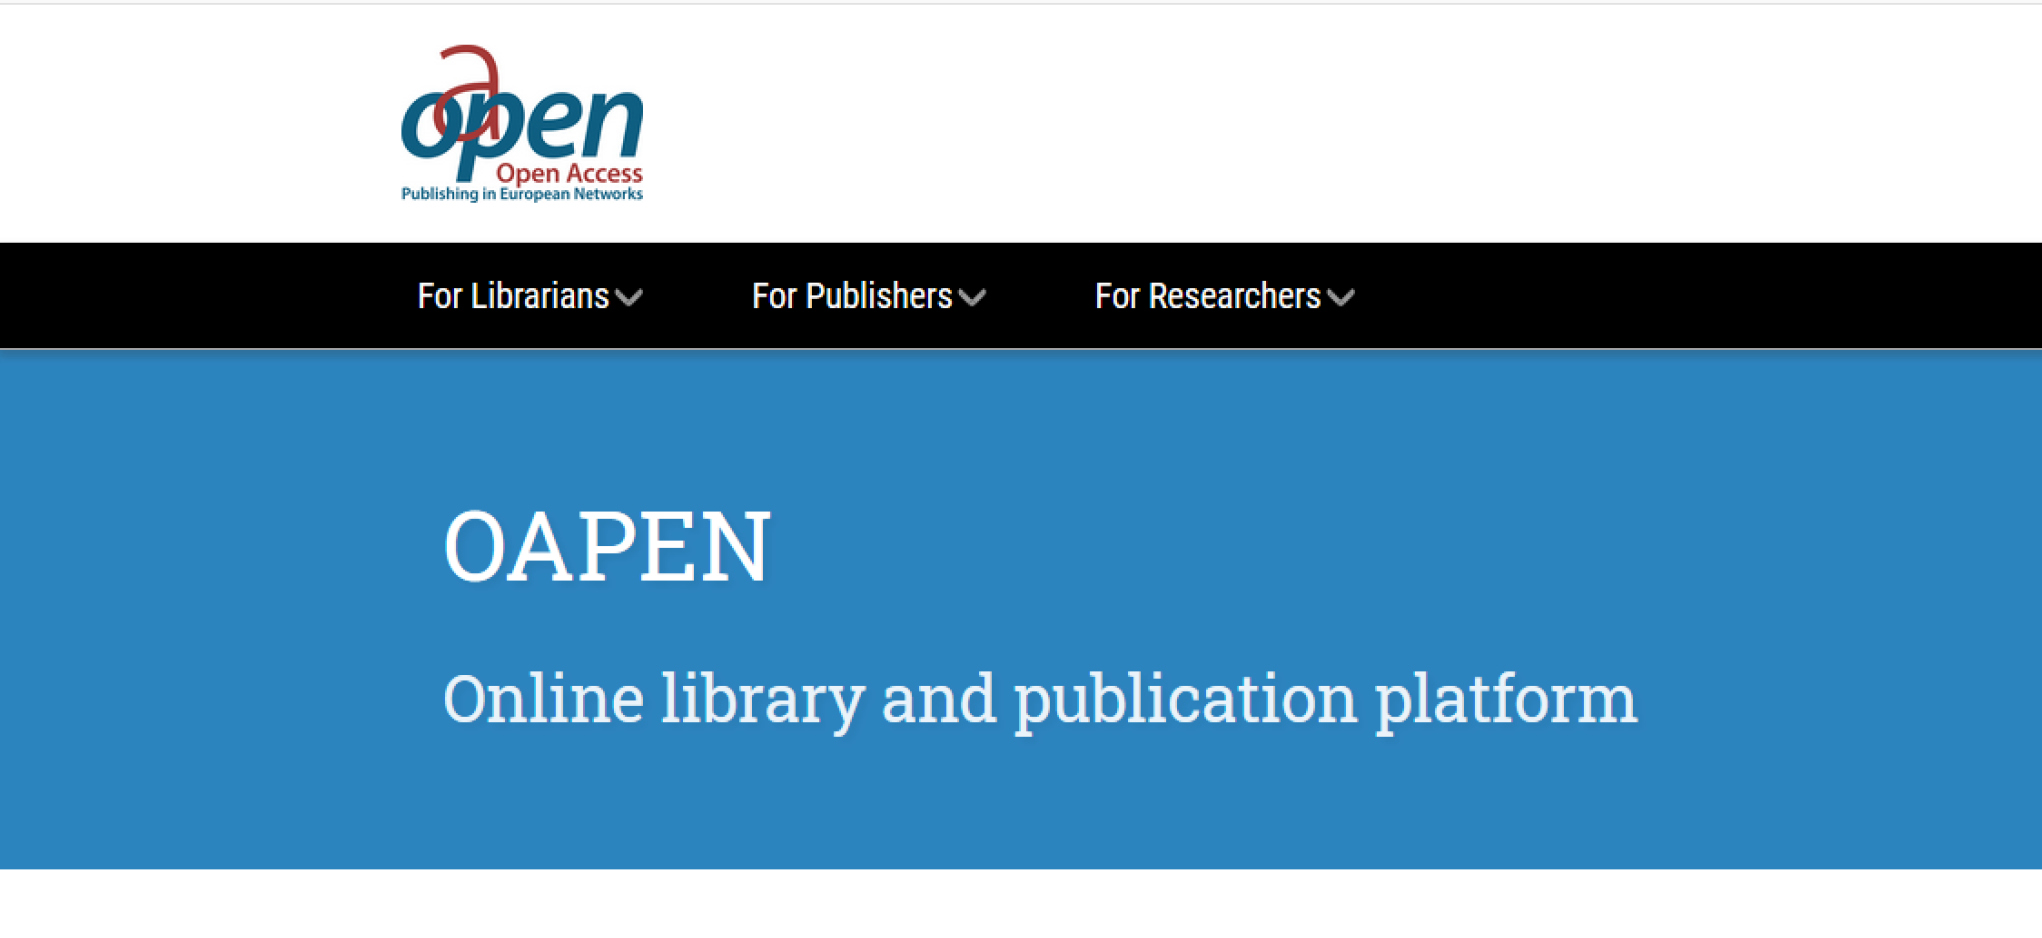 OAPEN launches new website